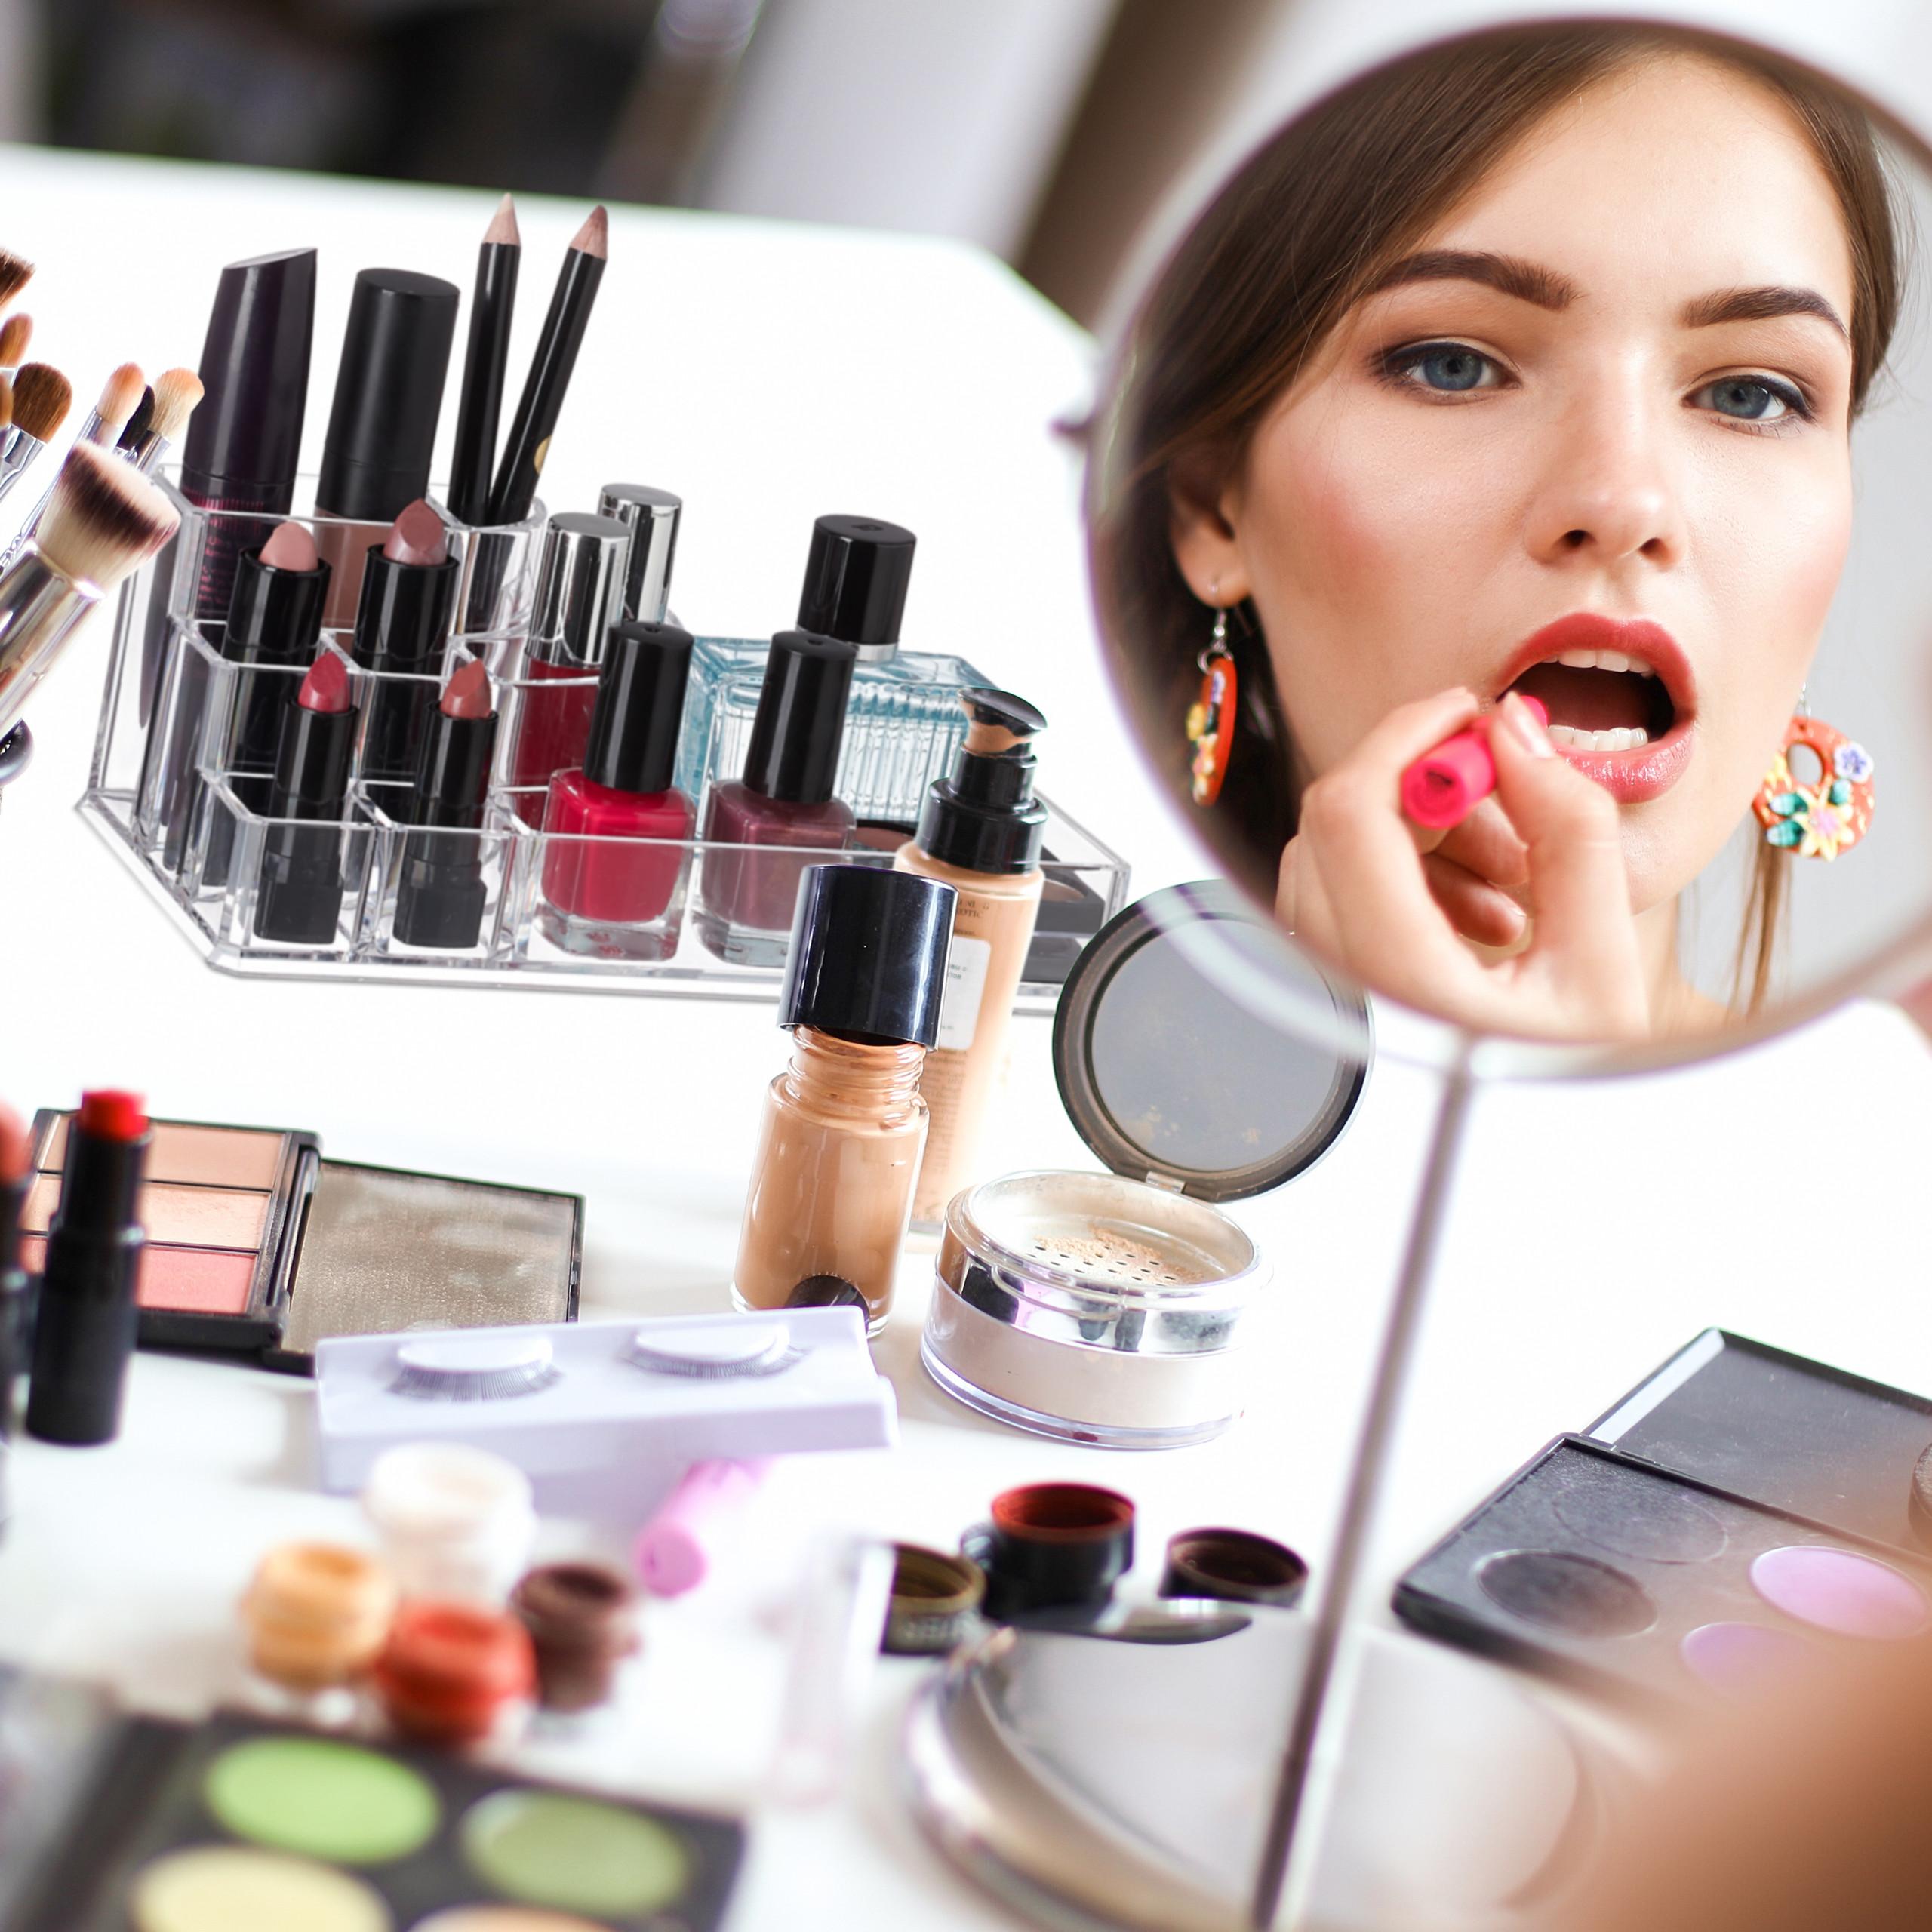 make-up-organizer-acryl-8-vakken-lippenstifthouder-opbergsysteem miniatuur 8